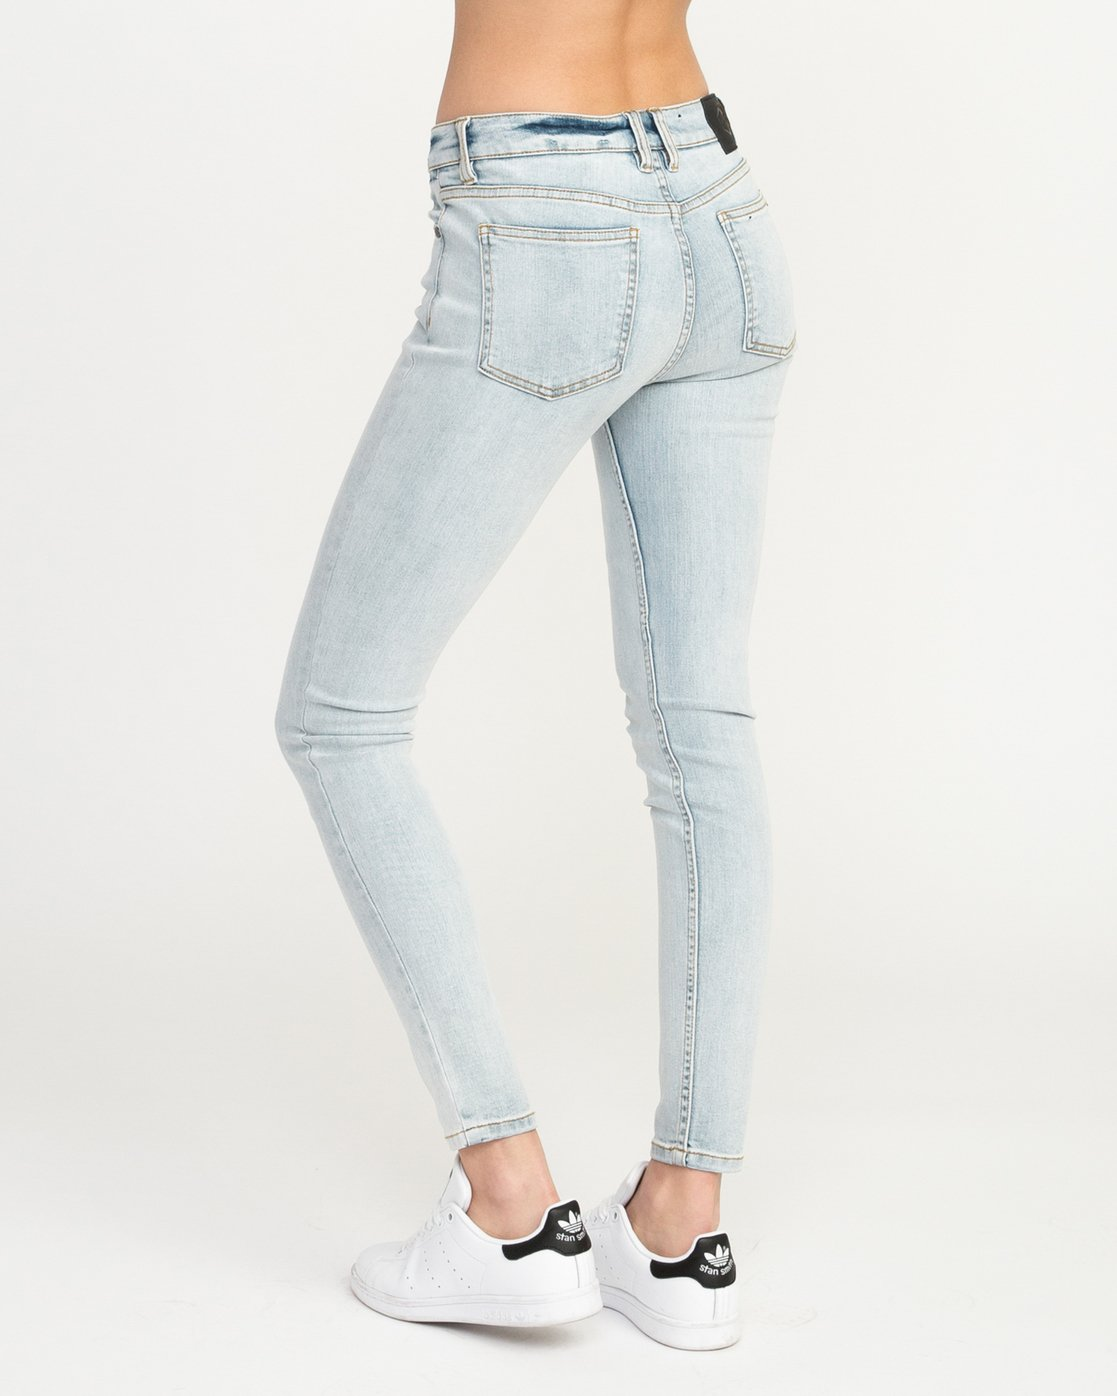 2 Dayley Mid Rise Denim Jeans White WCDP02DA RVCA